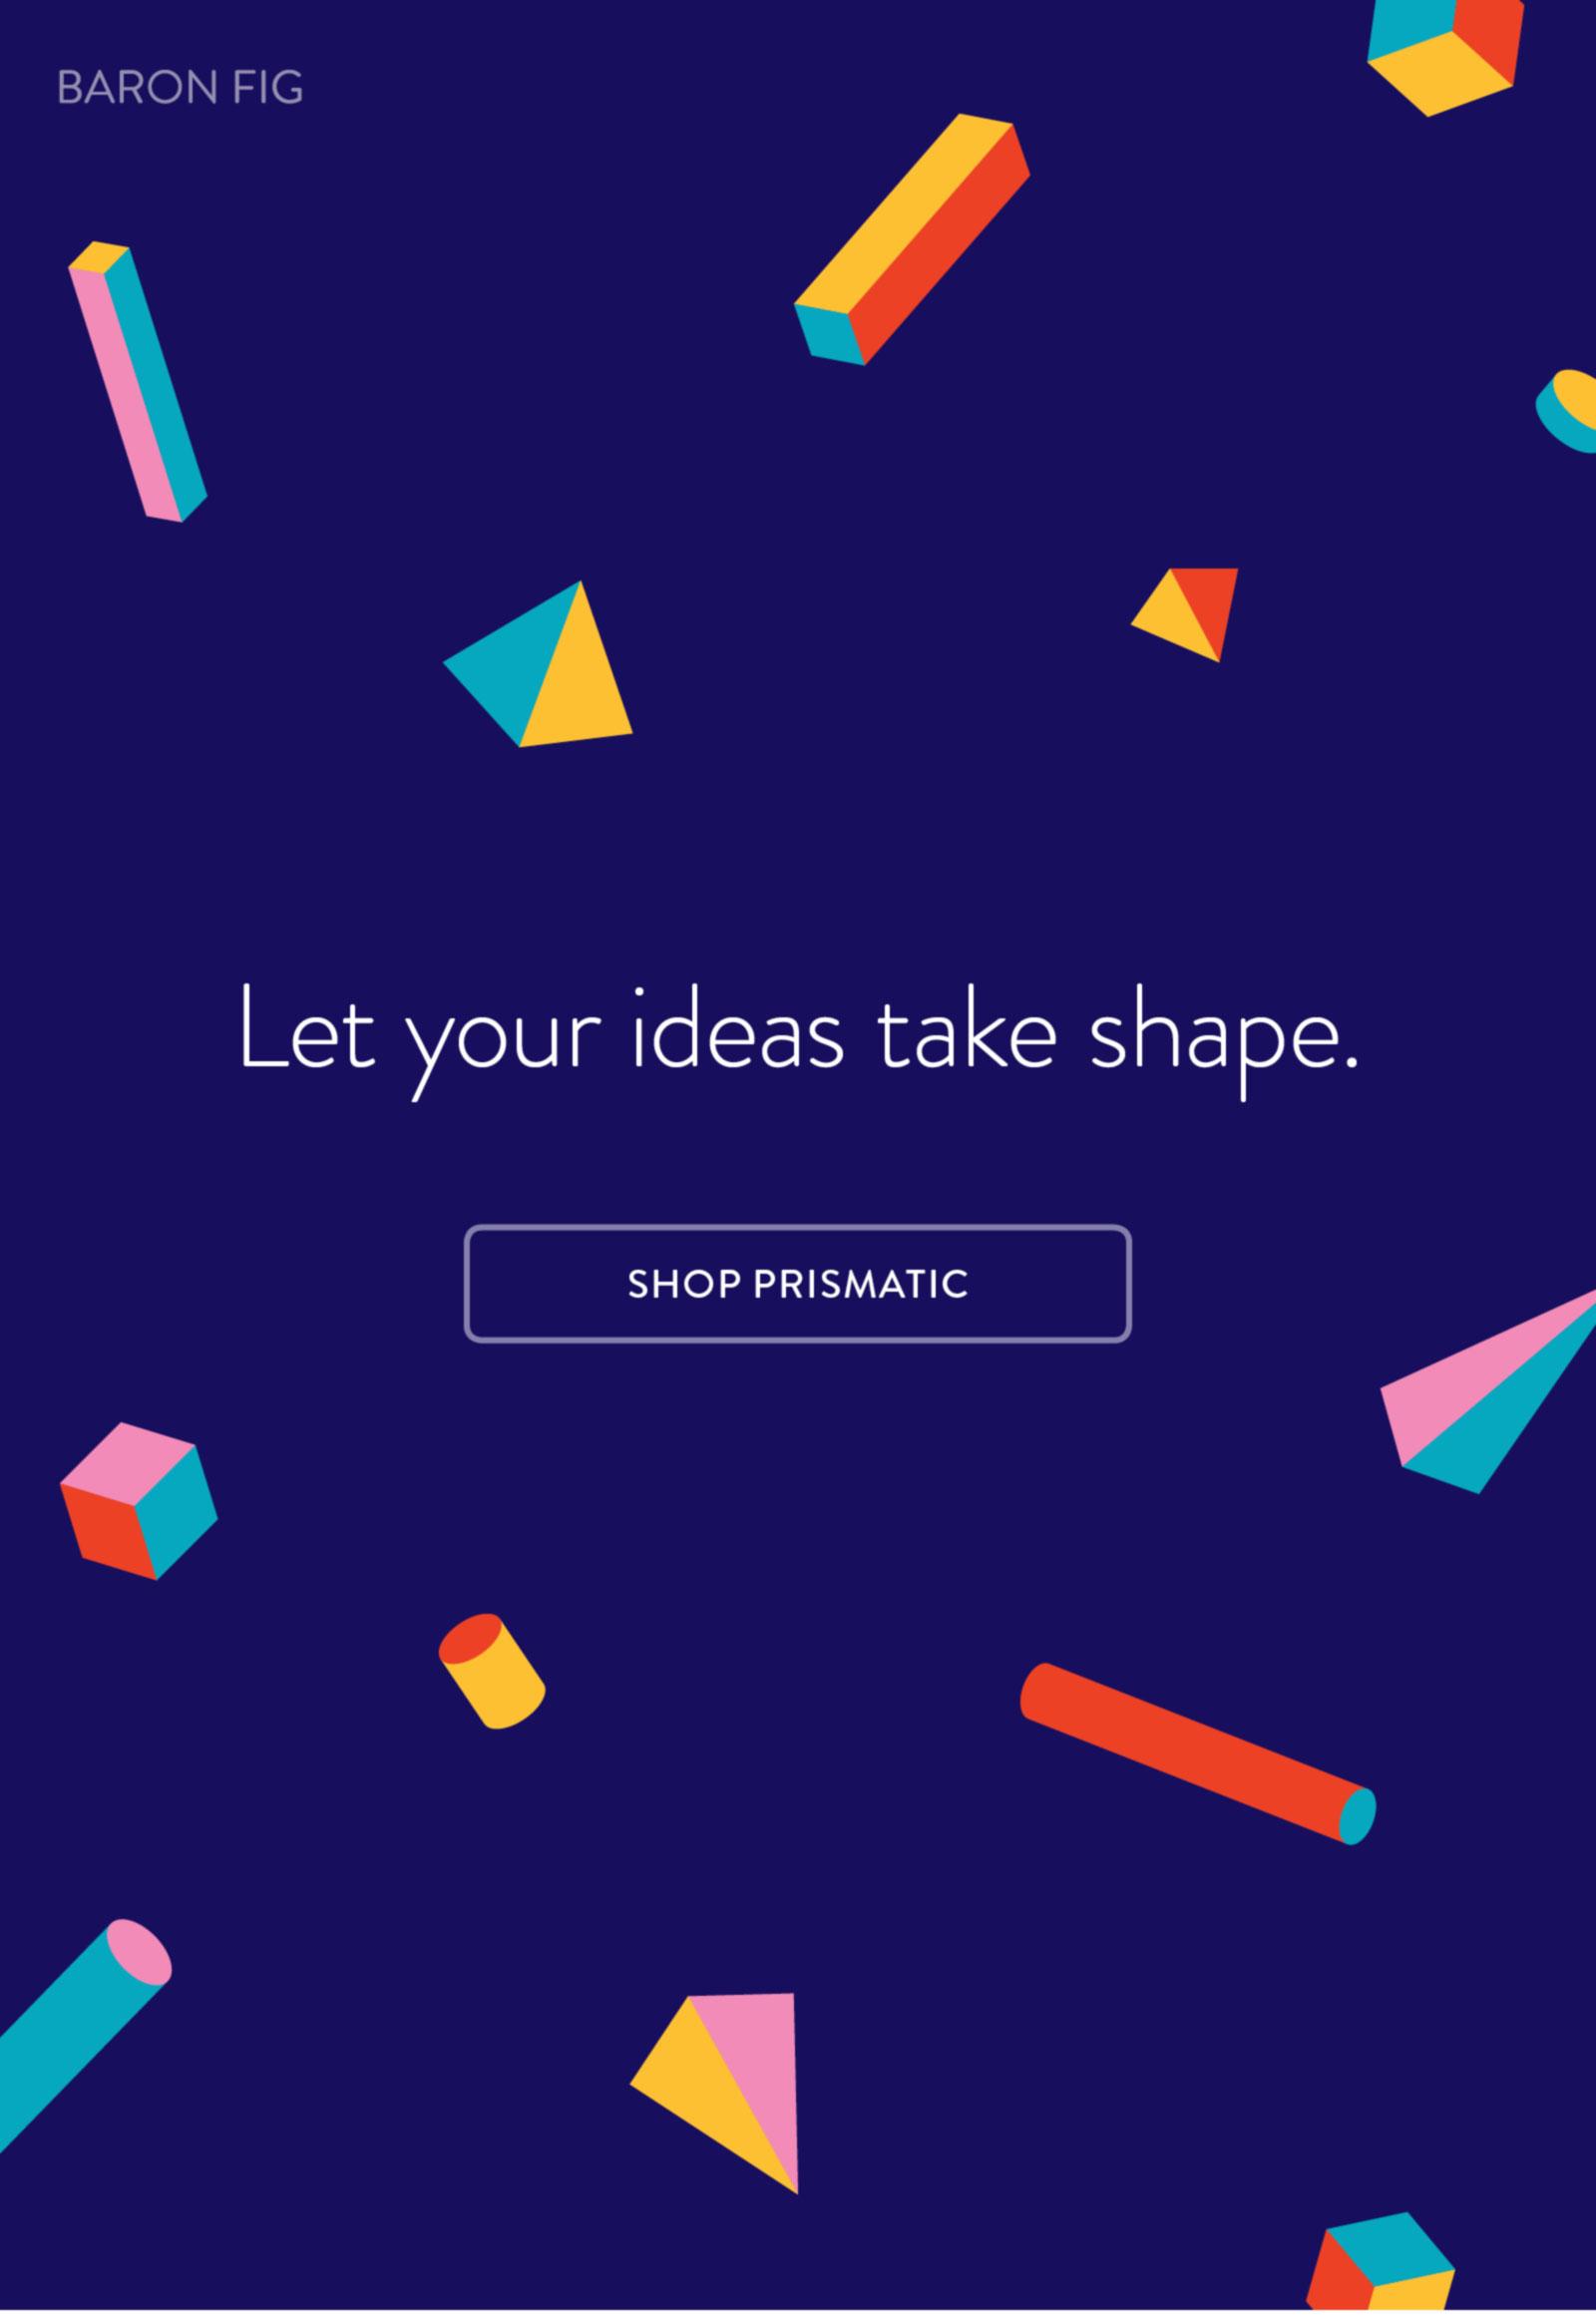 Let your ideas take shape.